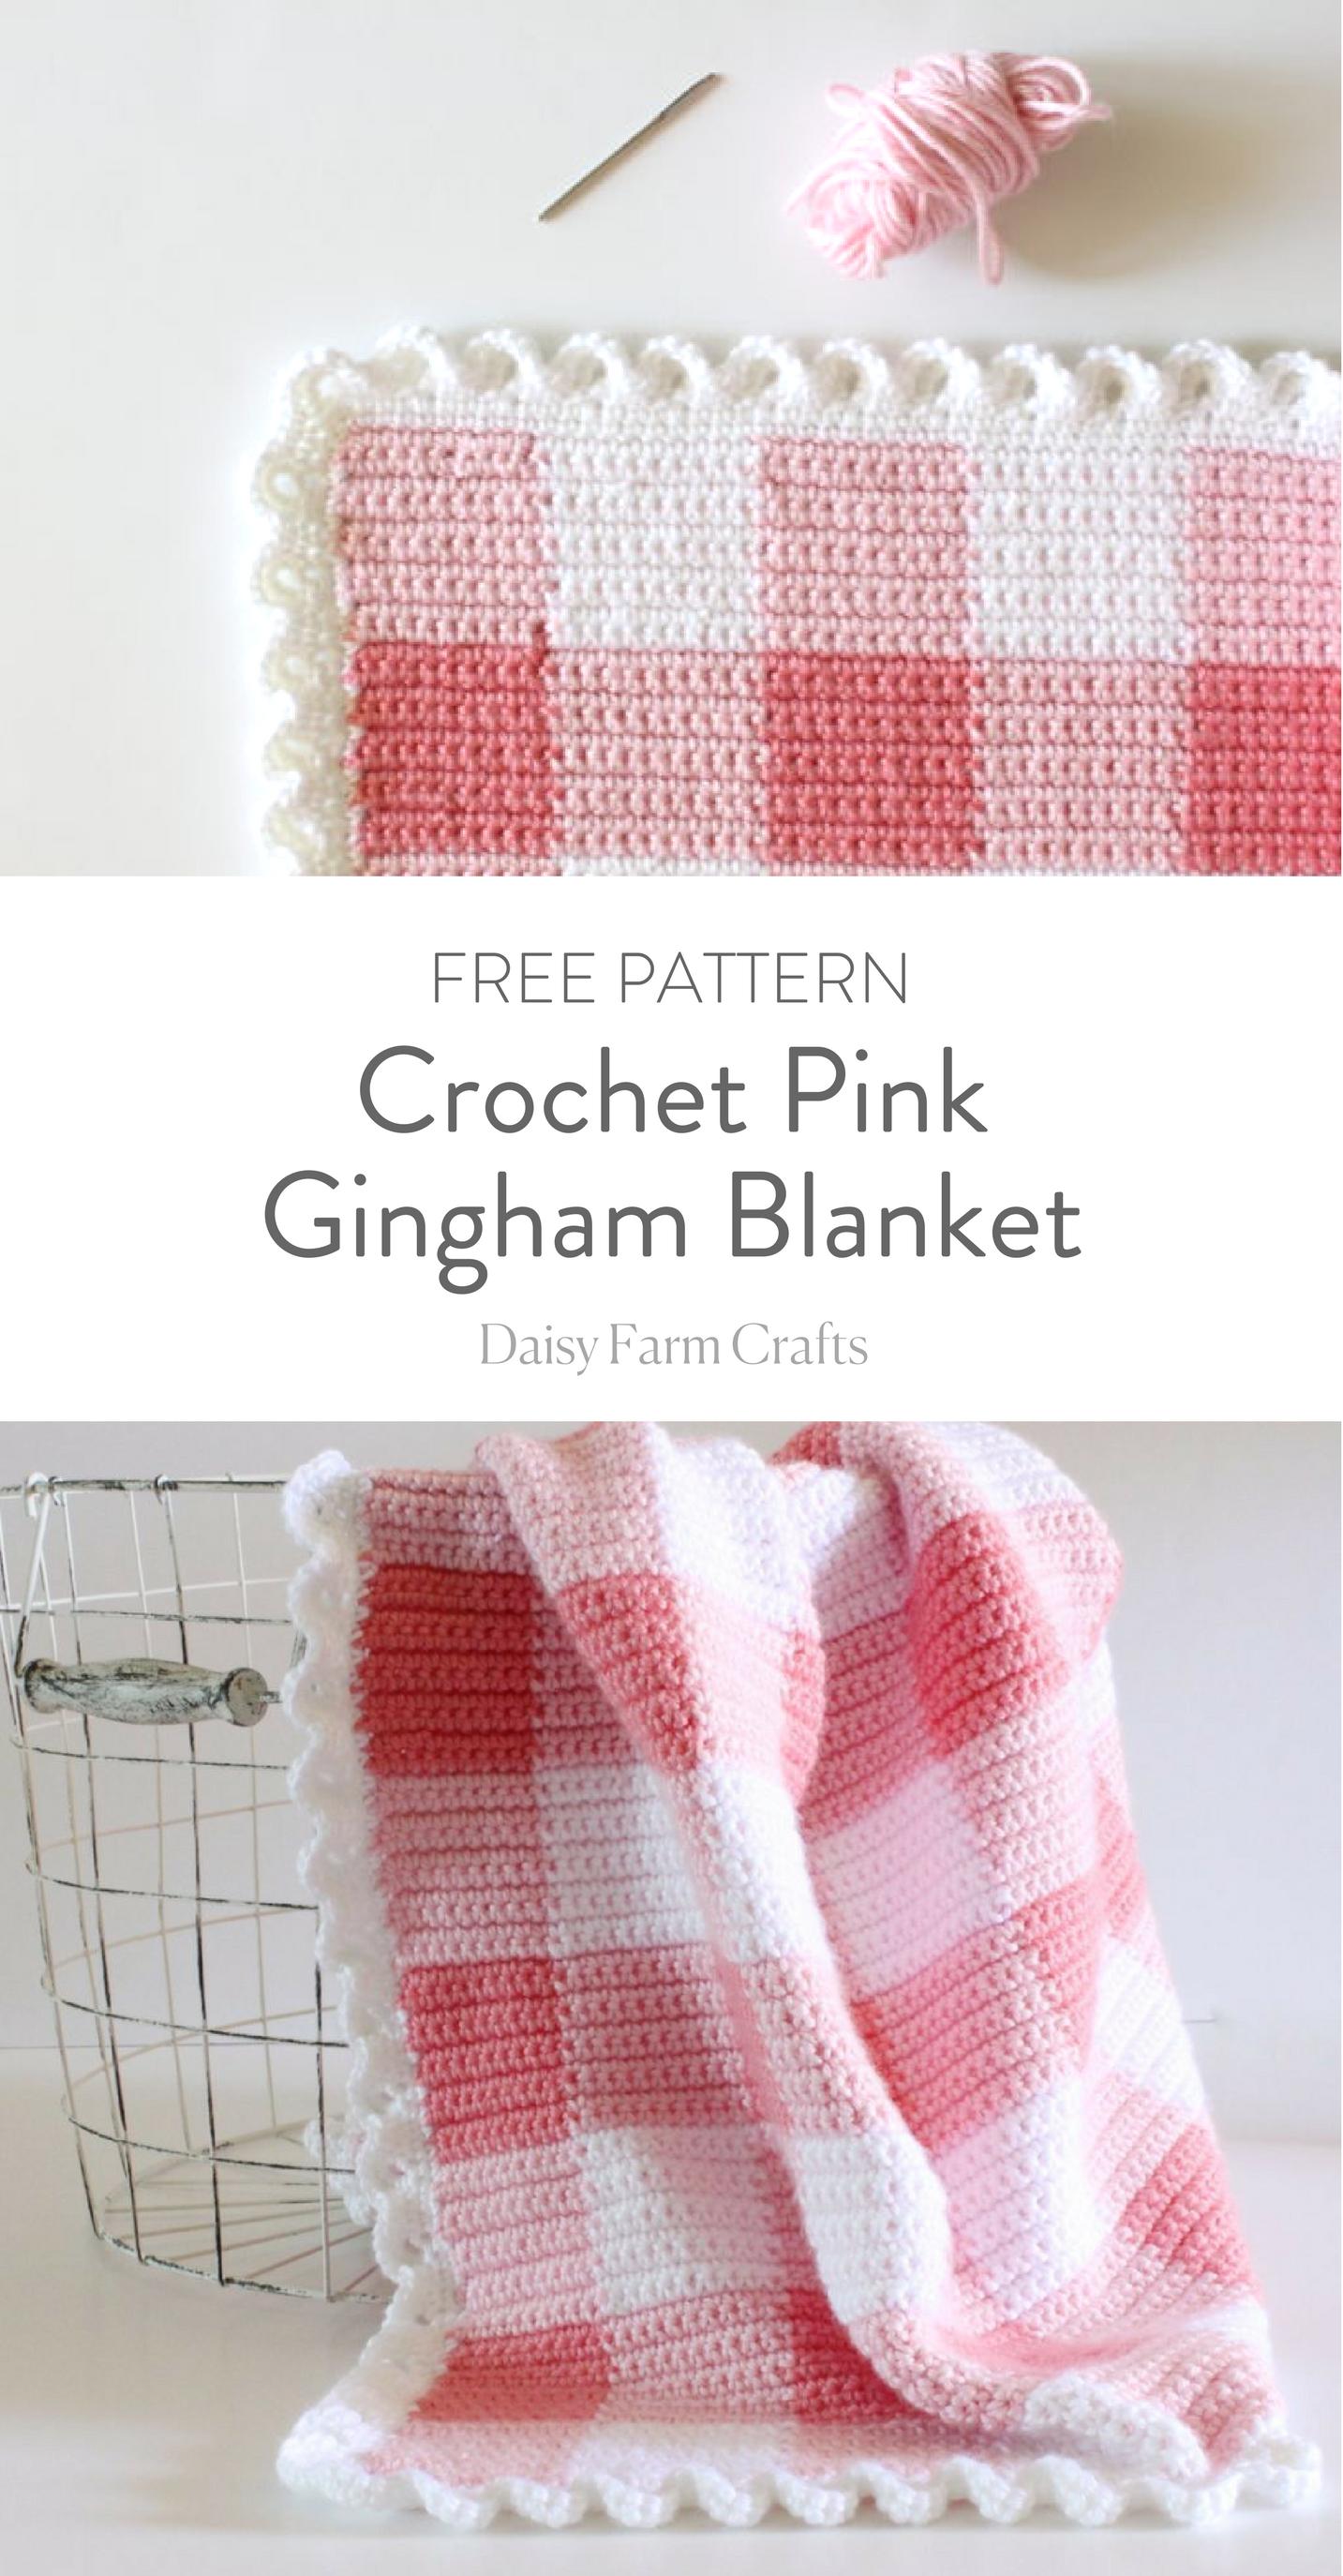 Pin de Amanda Faint en Crochet | Pinterest | Manta, Tejido y Ganchillo